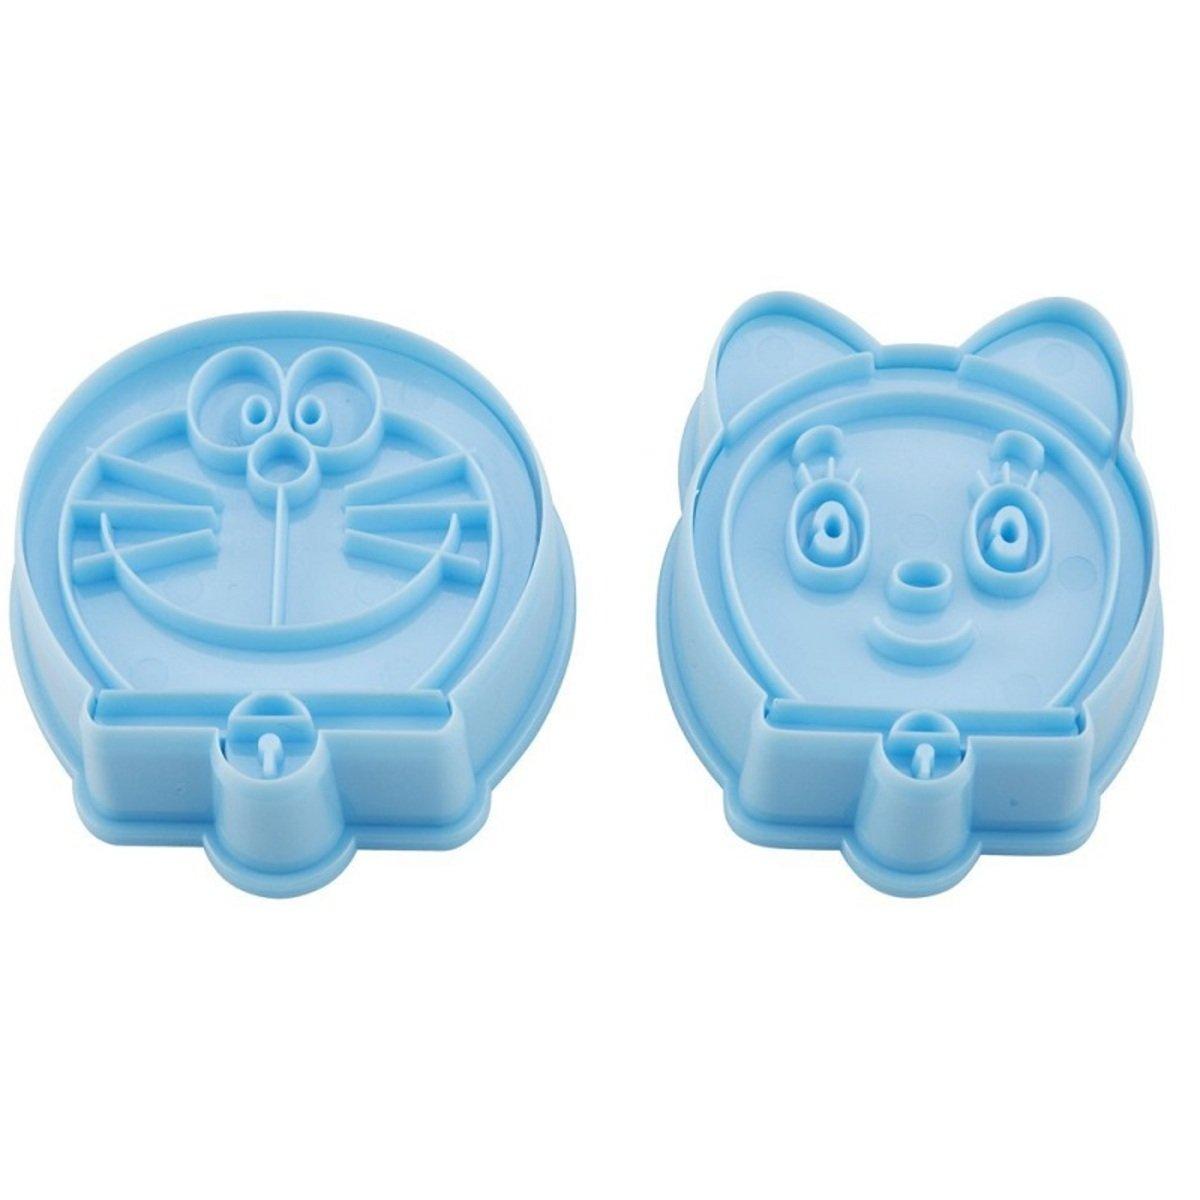 DN-0300 Doraemon 曲奇模 (2件裝)